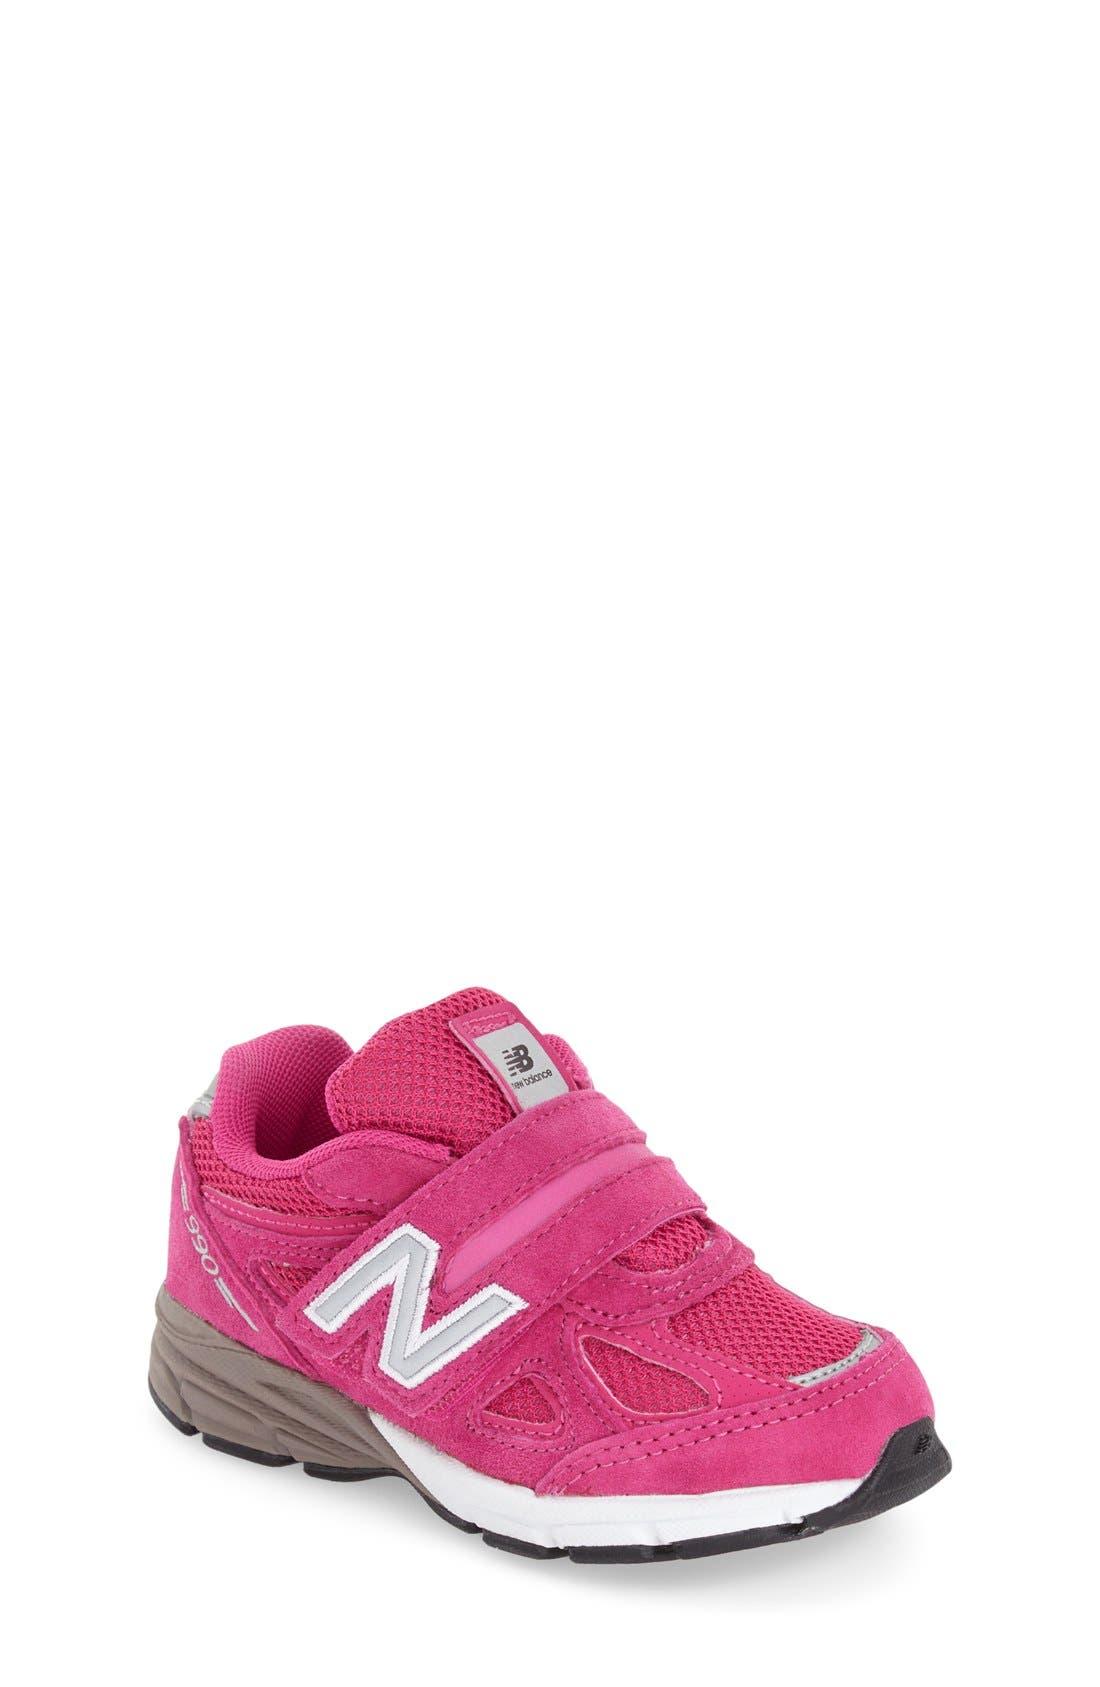 '990' Sneaker,                             Main thumbnail 1, color,                             Pink